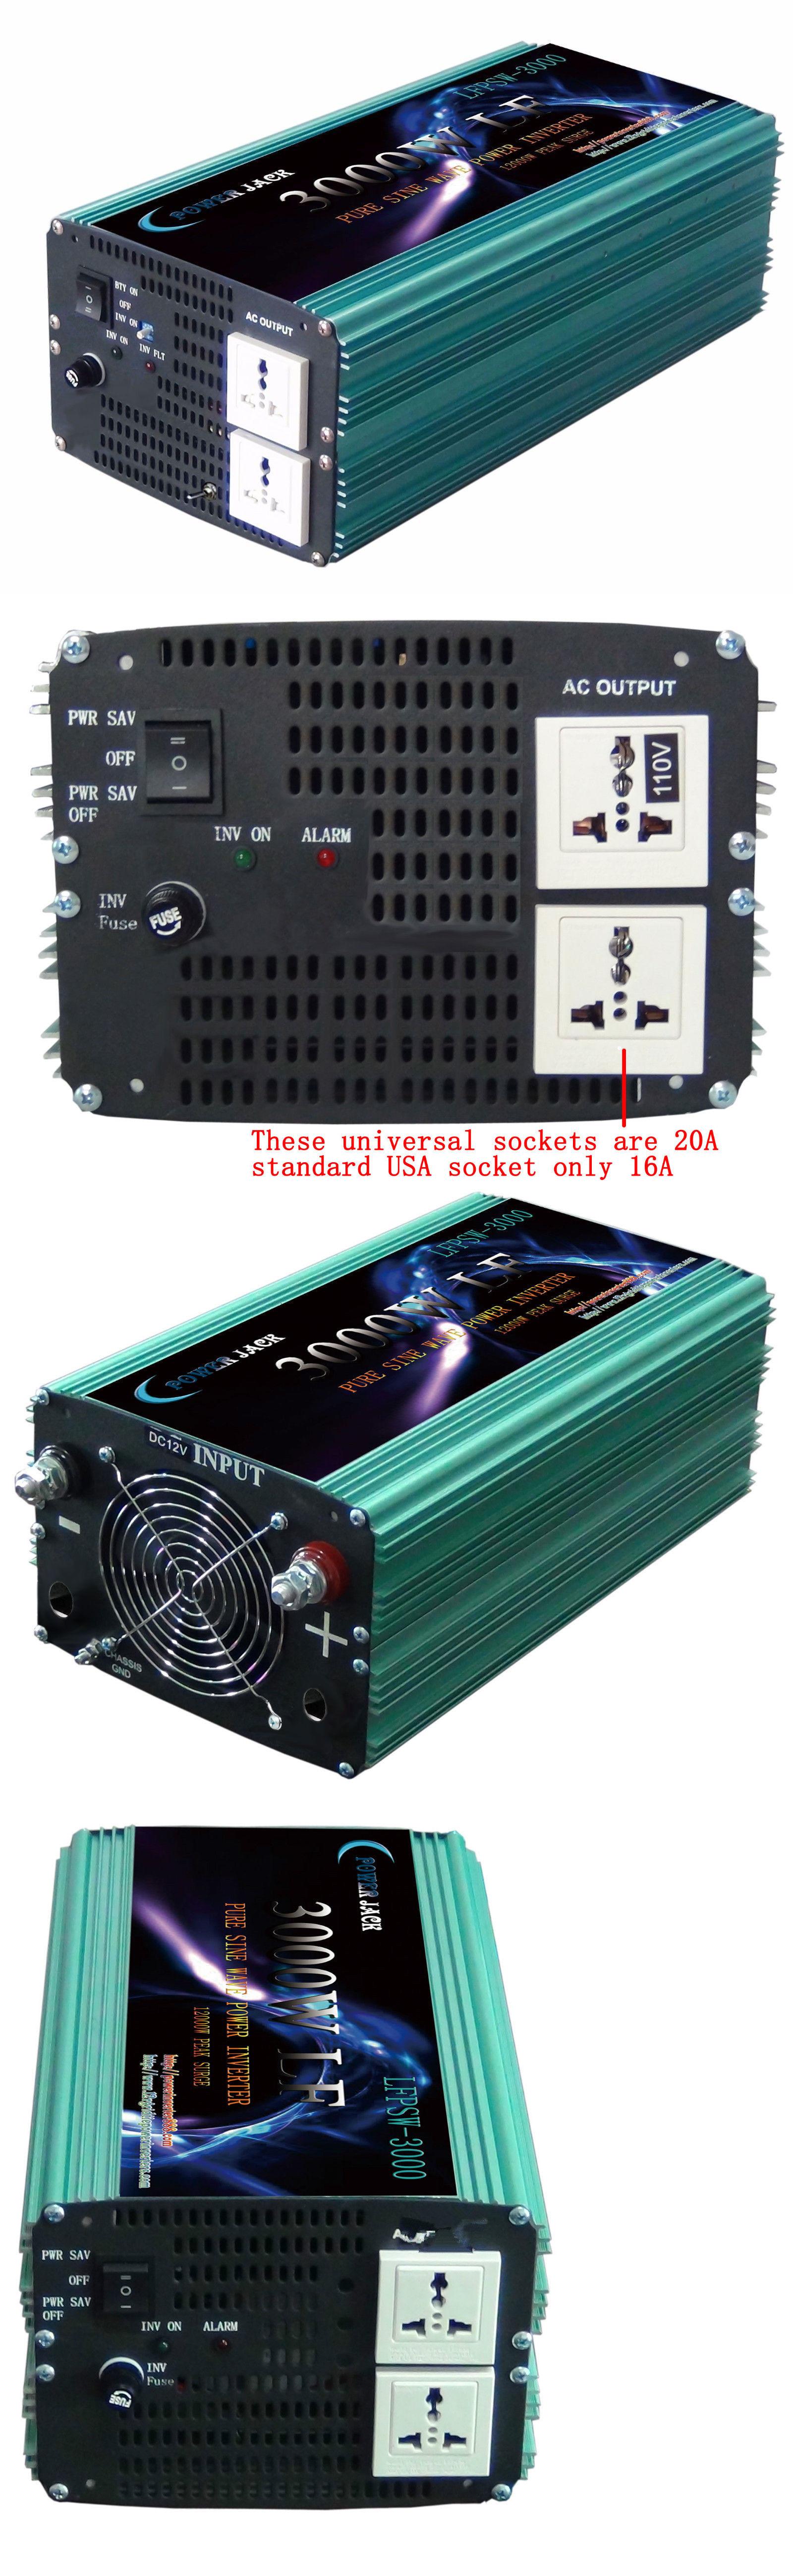 Power Inverters 5000w Lf Psw Solar Inverter Dc 24v Ac 500w Mosfet From 12v To 110v 220v 3000w Pure Sine Wave Ac110v 60hz Tool